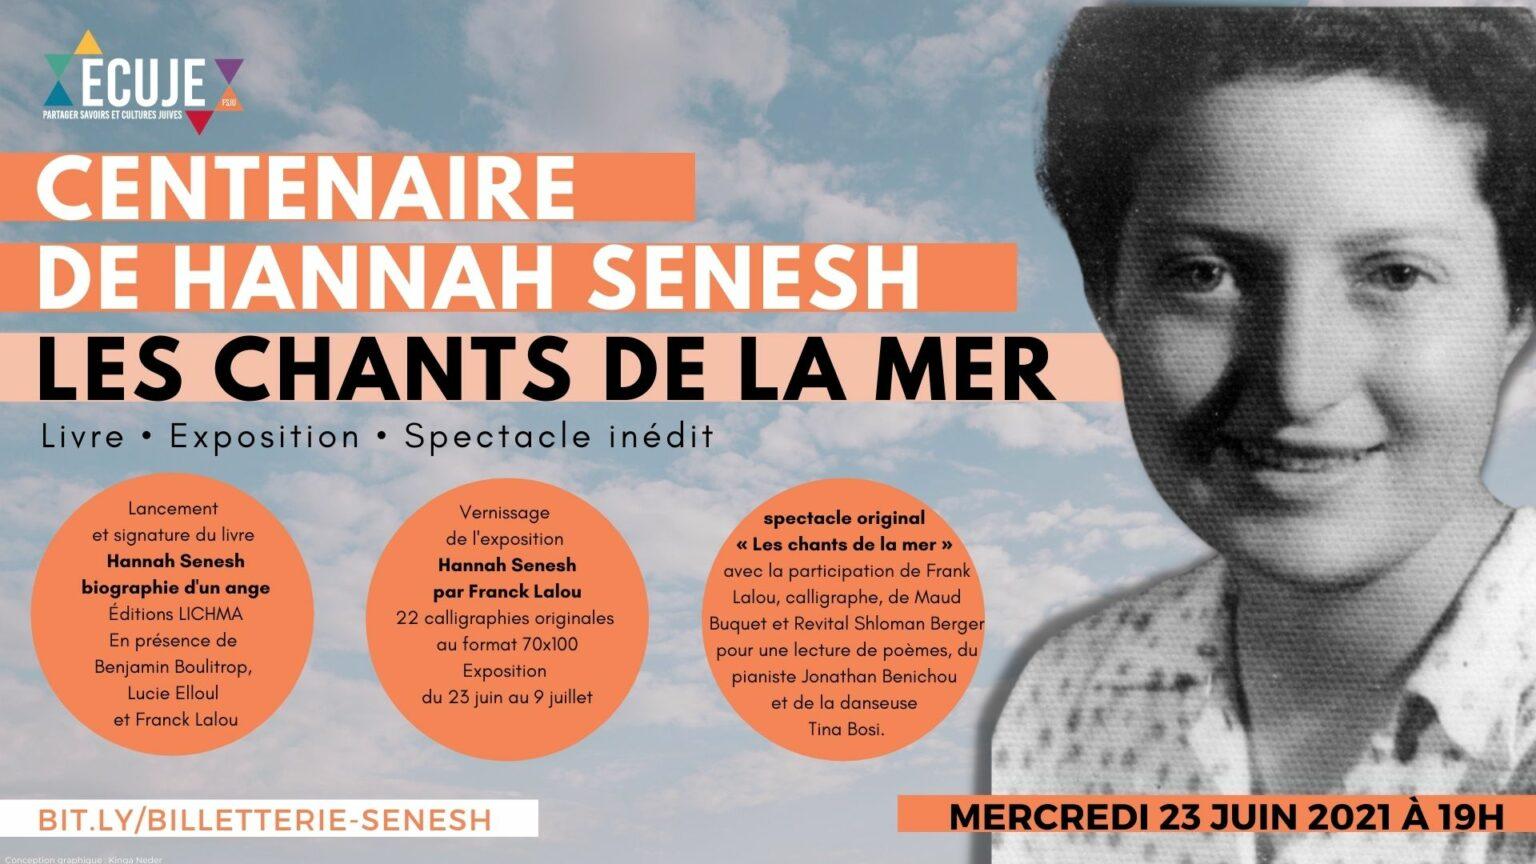 Centenaire de la naissance de Hannah Senesh: les chants de la mer